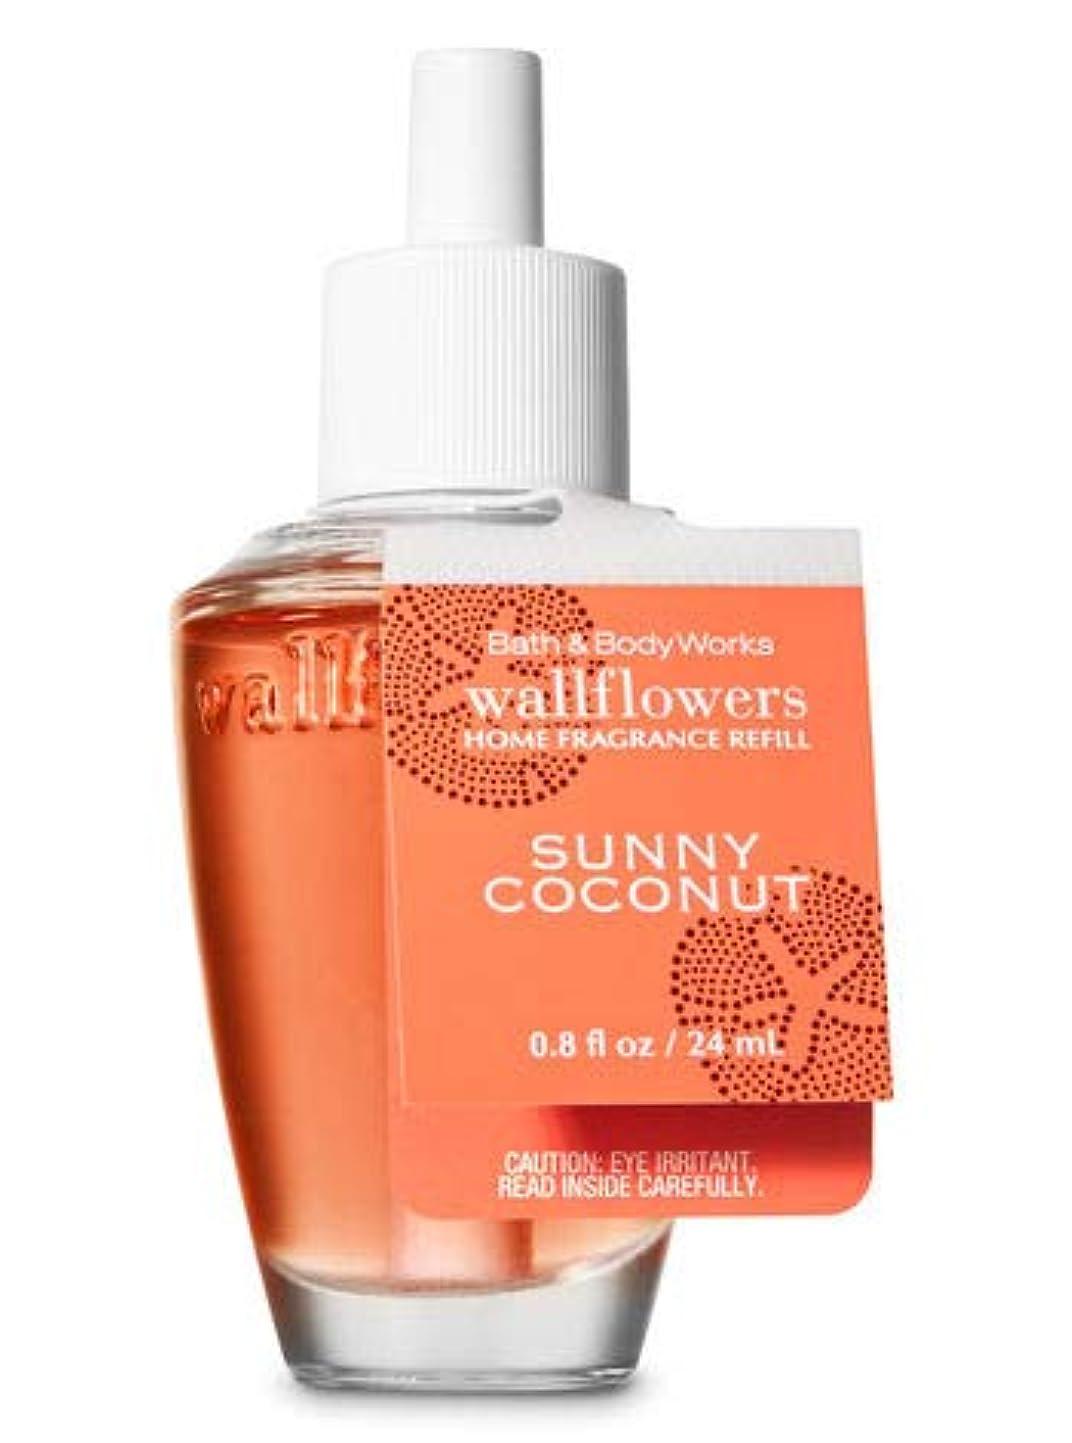 【Bath&Body Works/バス&ボディワークス】 ルームフレグランス 詰替えリフィル サニーココナッツ Wallflowers Home Fragrance Refill Sunny Coconut [並行輸入品]